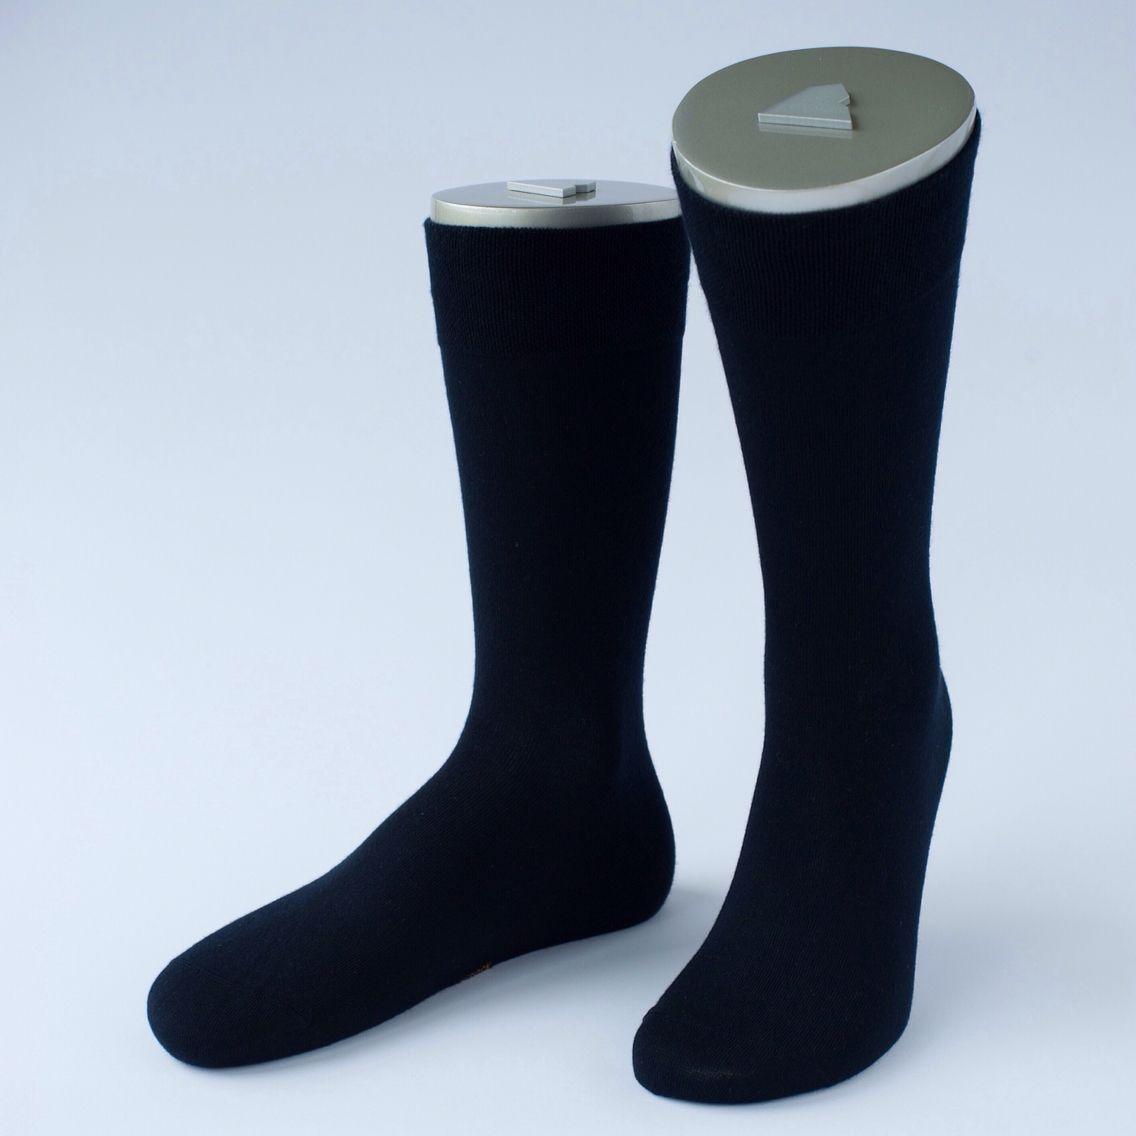 MonteAntelao socks in Marine color⚓️ #rocksock #rocksockofficial #monteantelao #marine #blue #socks #goodmorning #ootd #outfit #wear #menswear #fashion #mensfashion #style #mensstyle #men #luxury #colorful #gentlemen